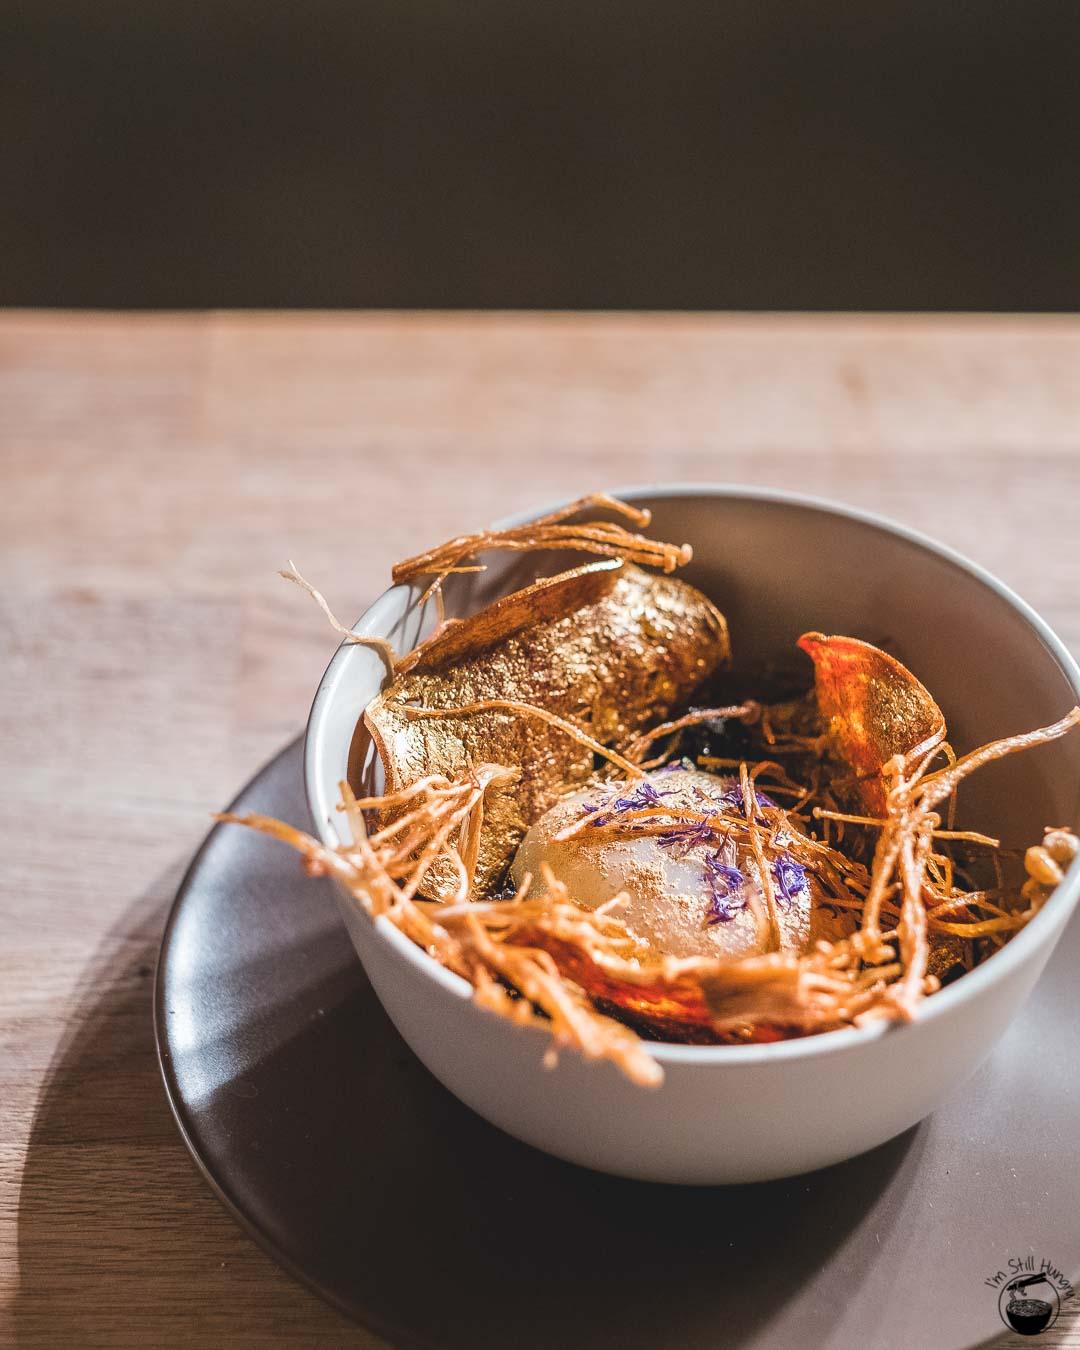 Blue Wren Restaurant Golden egg, bronzed spiced meats, squid ink rice, enoki mushrooms